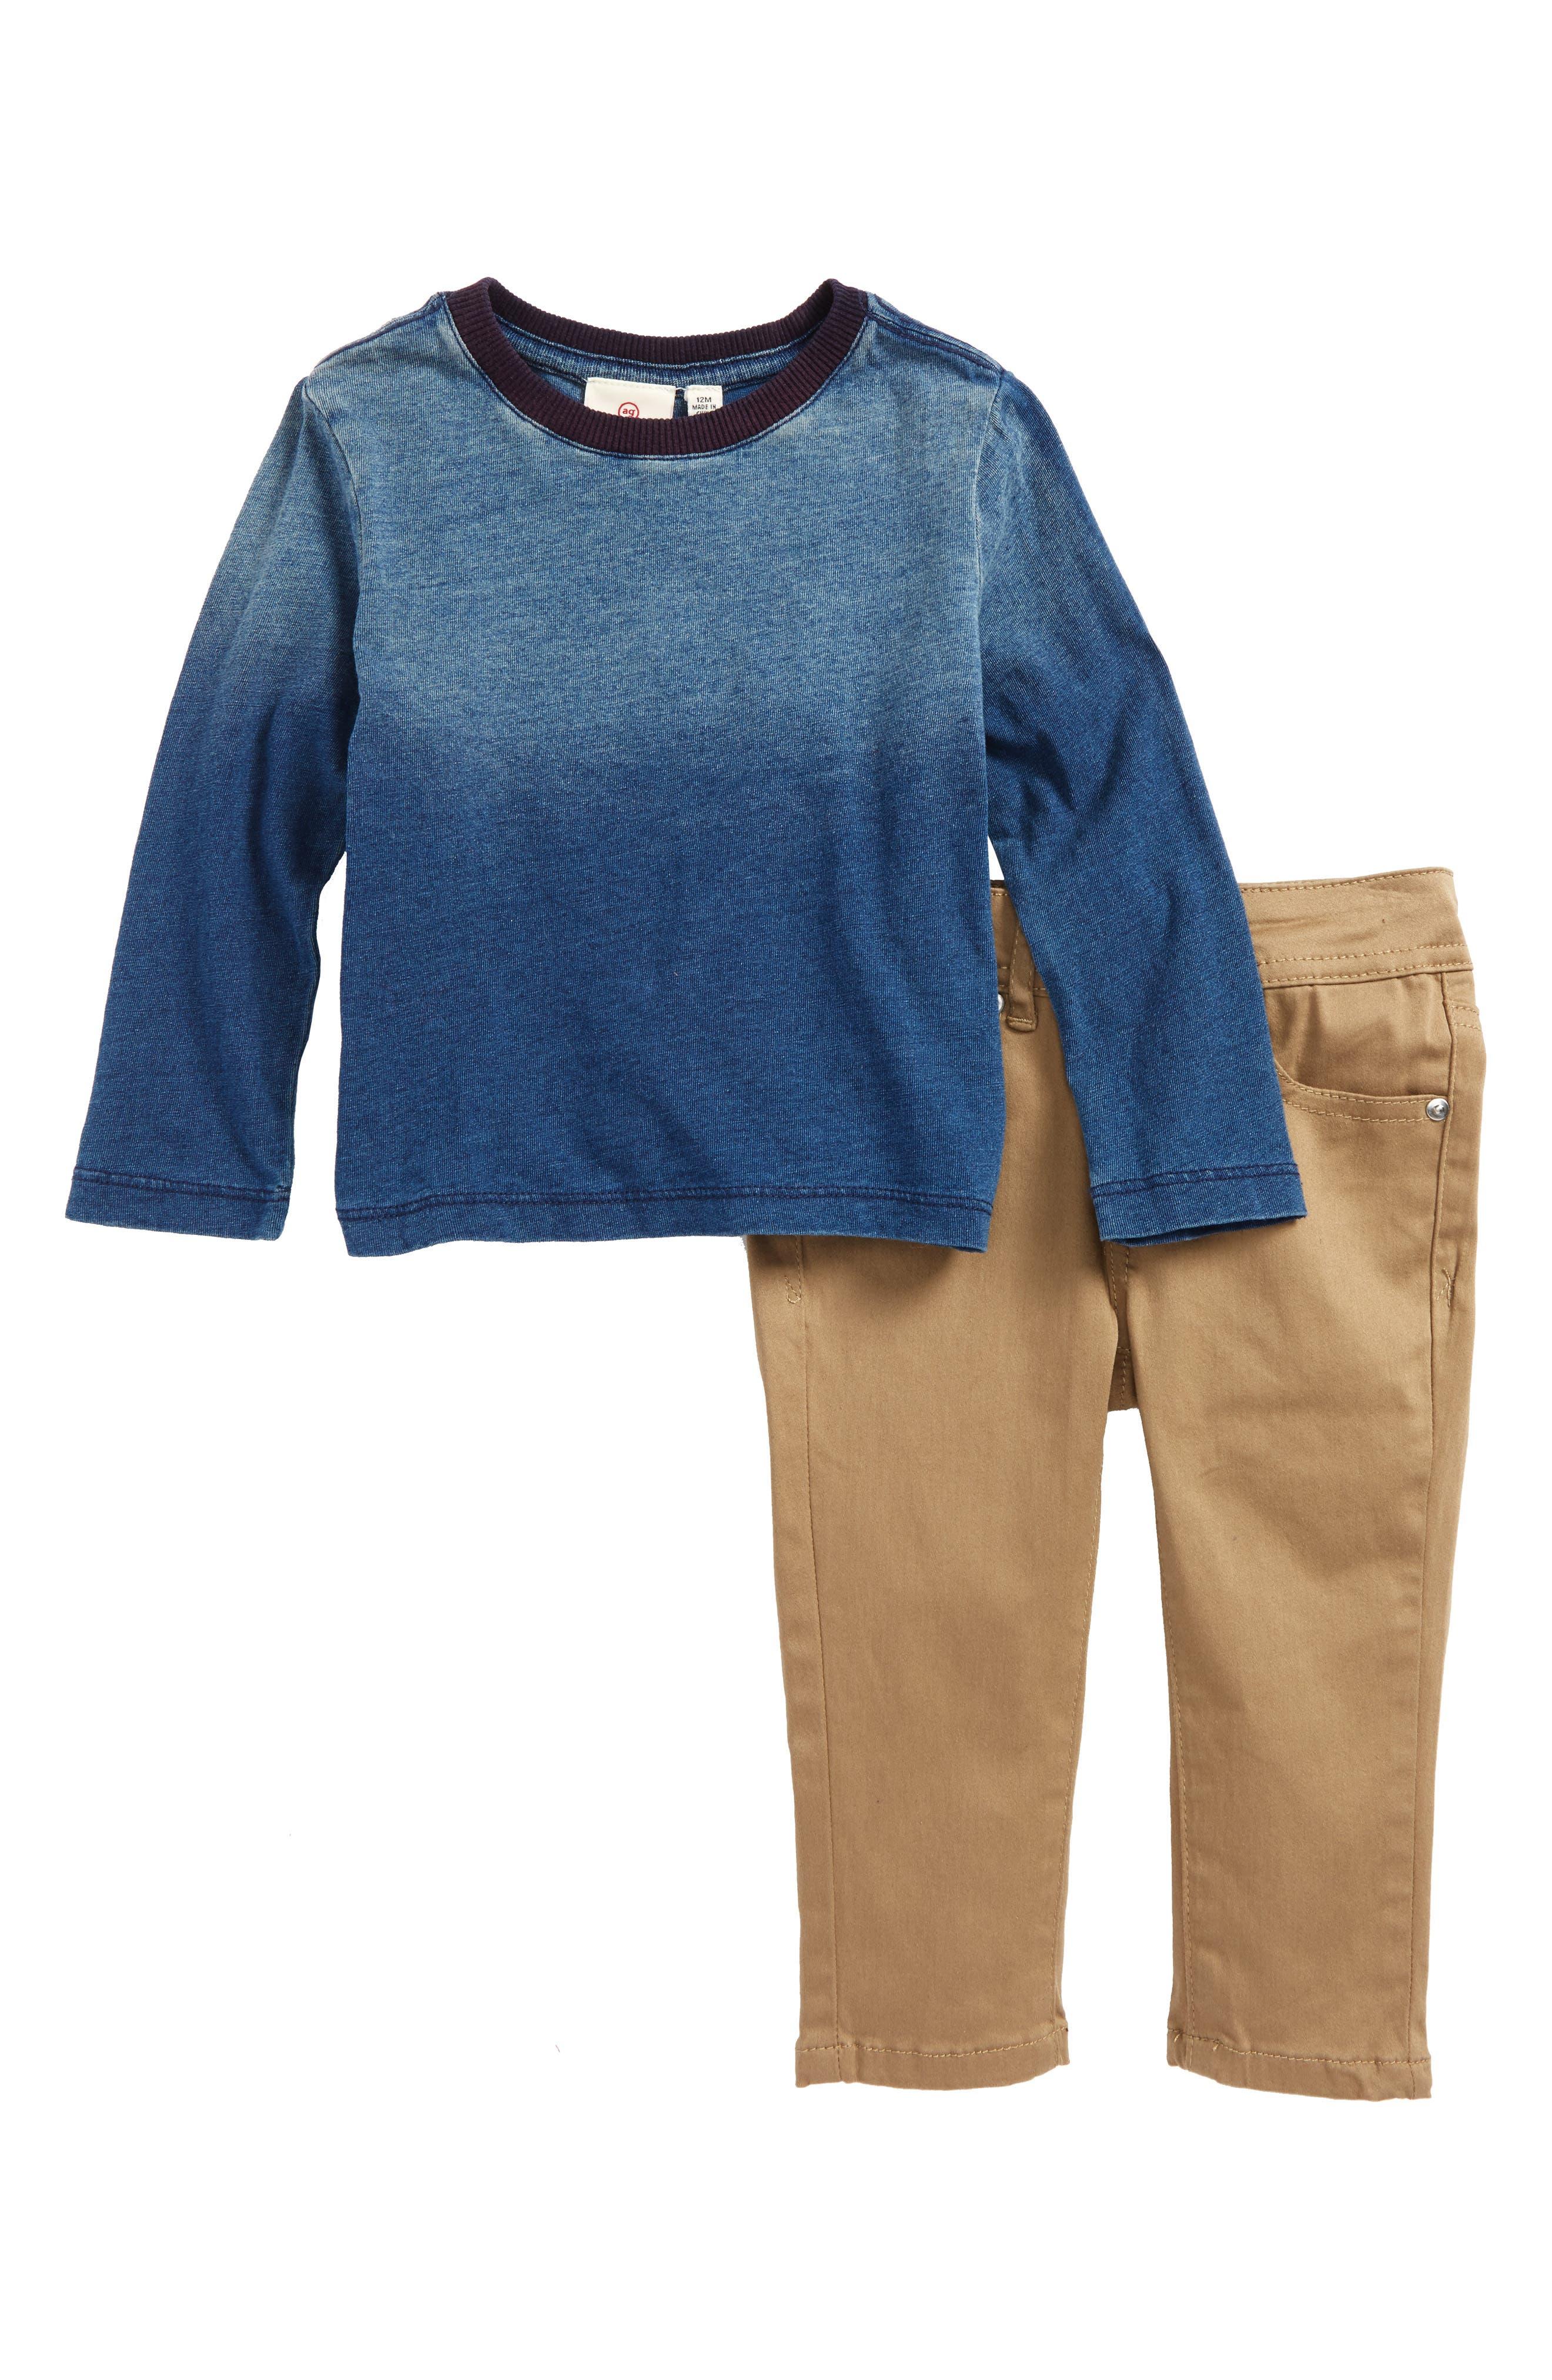 Main Image - ag adriano goldschmied kids T-Shirt & Pants Set (Baby Boys)